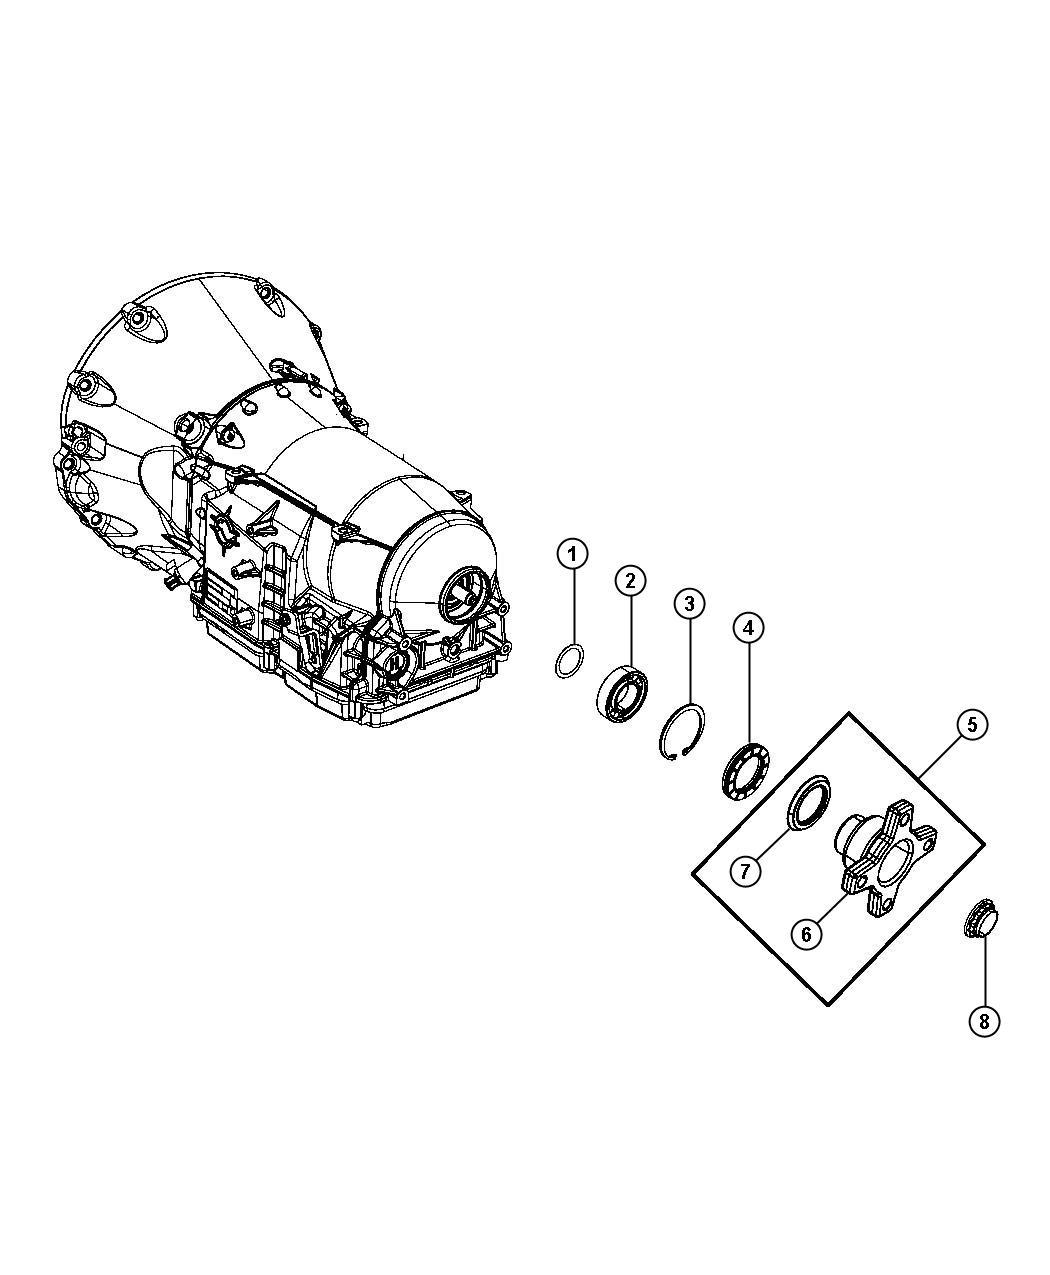 Ab jeep flange assembly output